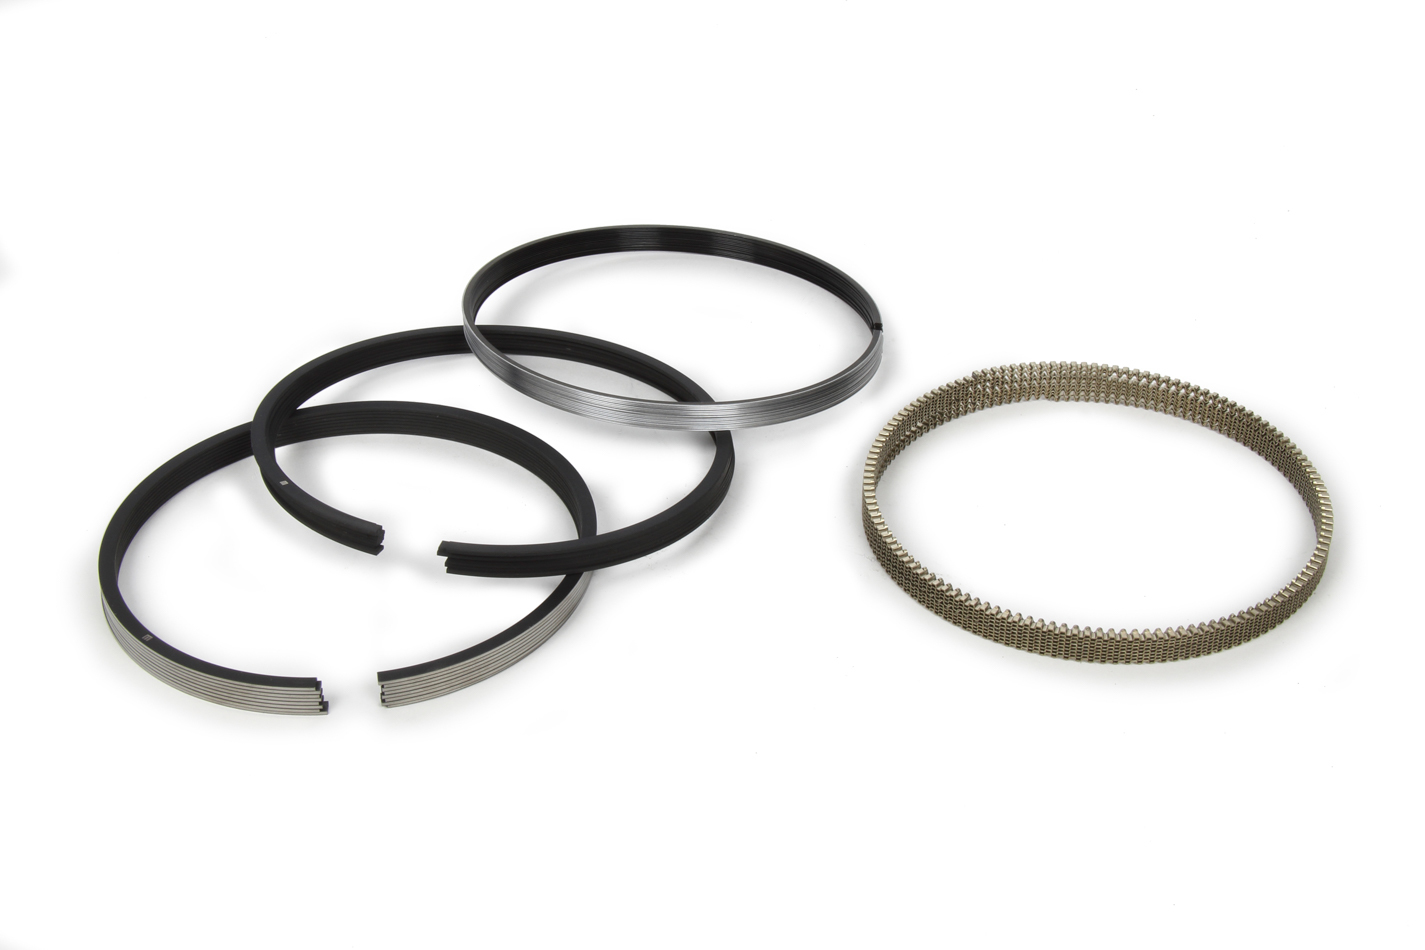 Piston Ring Set 4.125 Bore 1.0 1.0 2.0mm